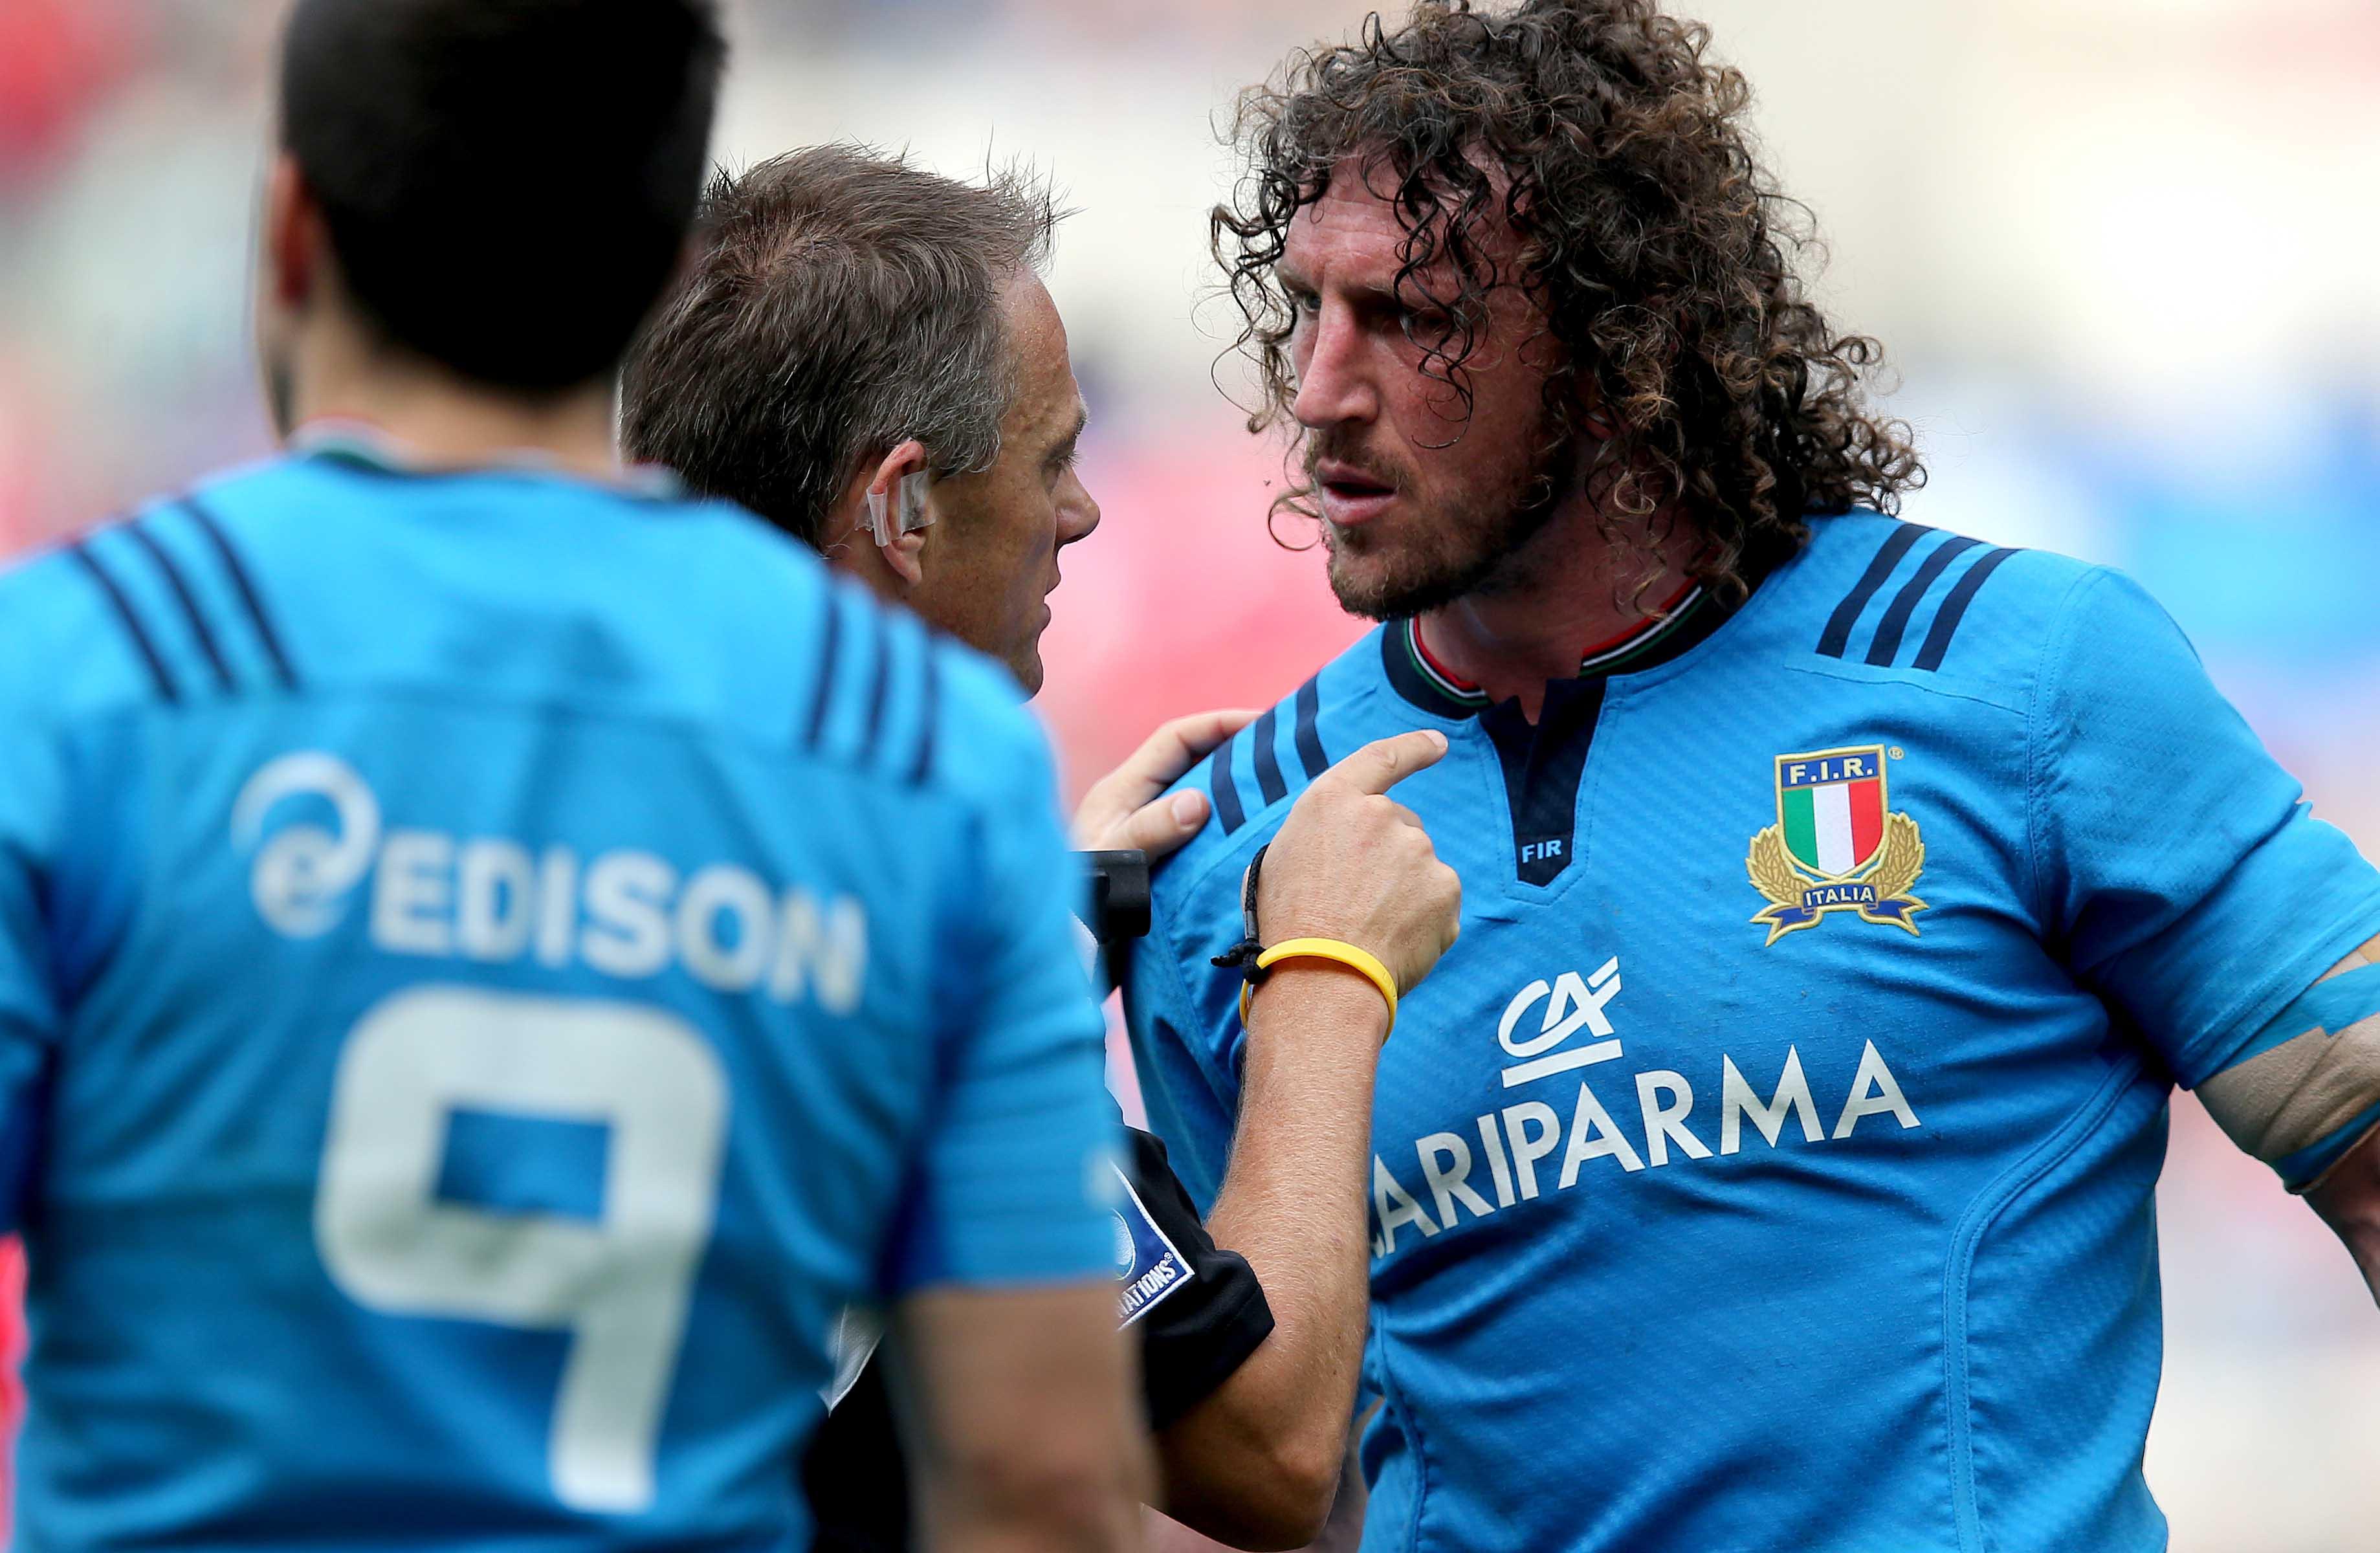 Mauro Bergamasco with referee Chris Pollock